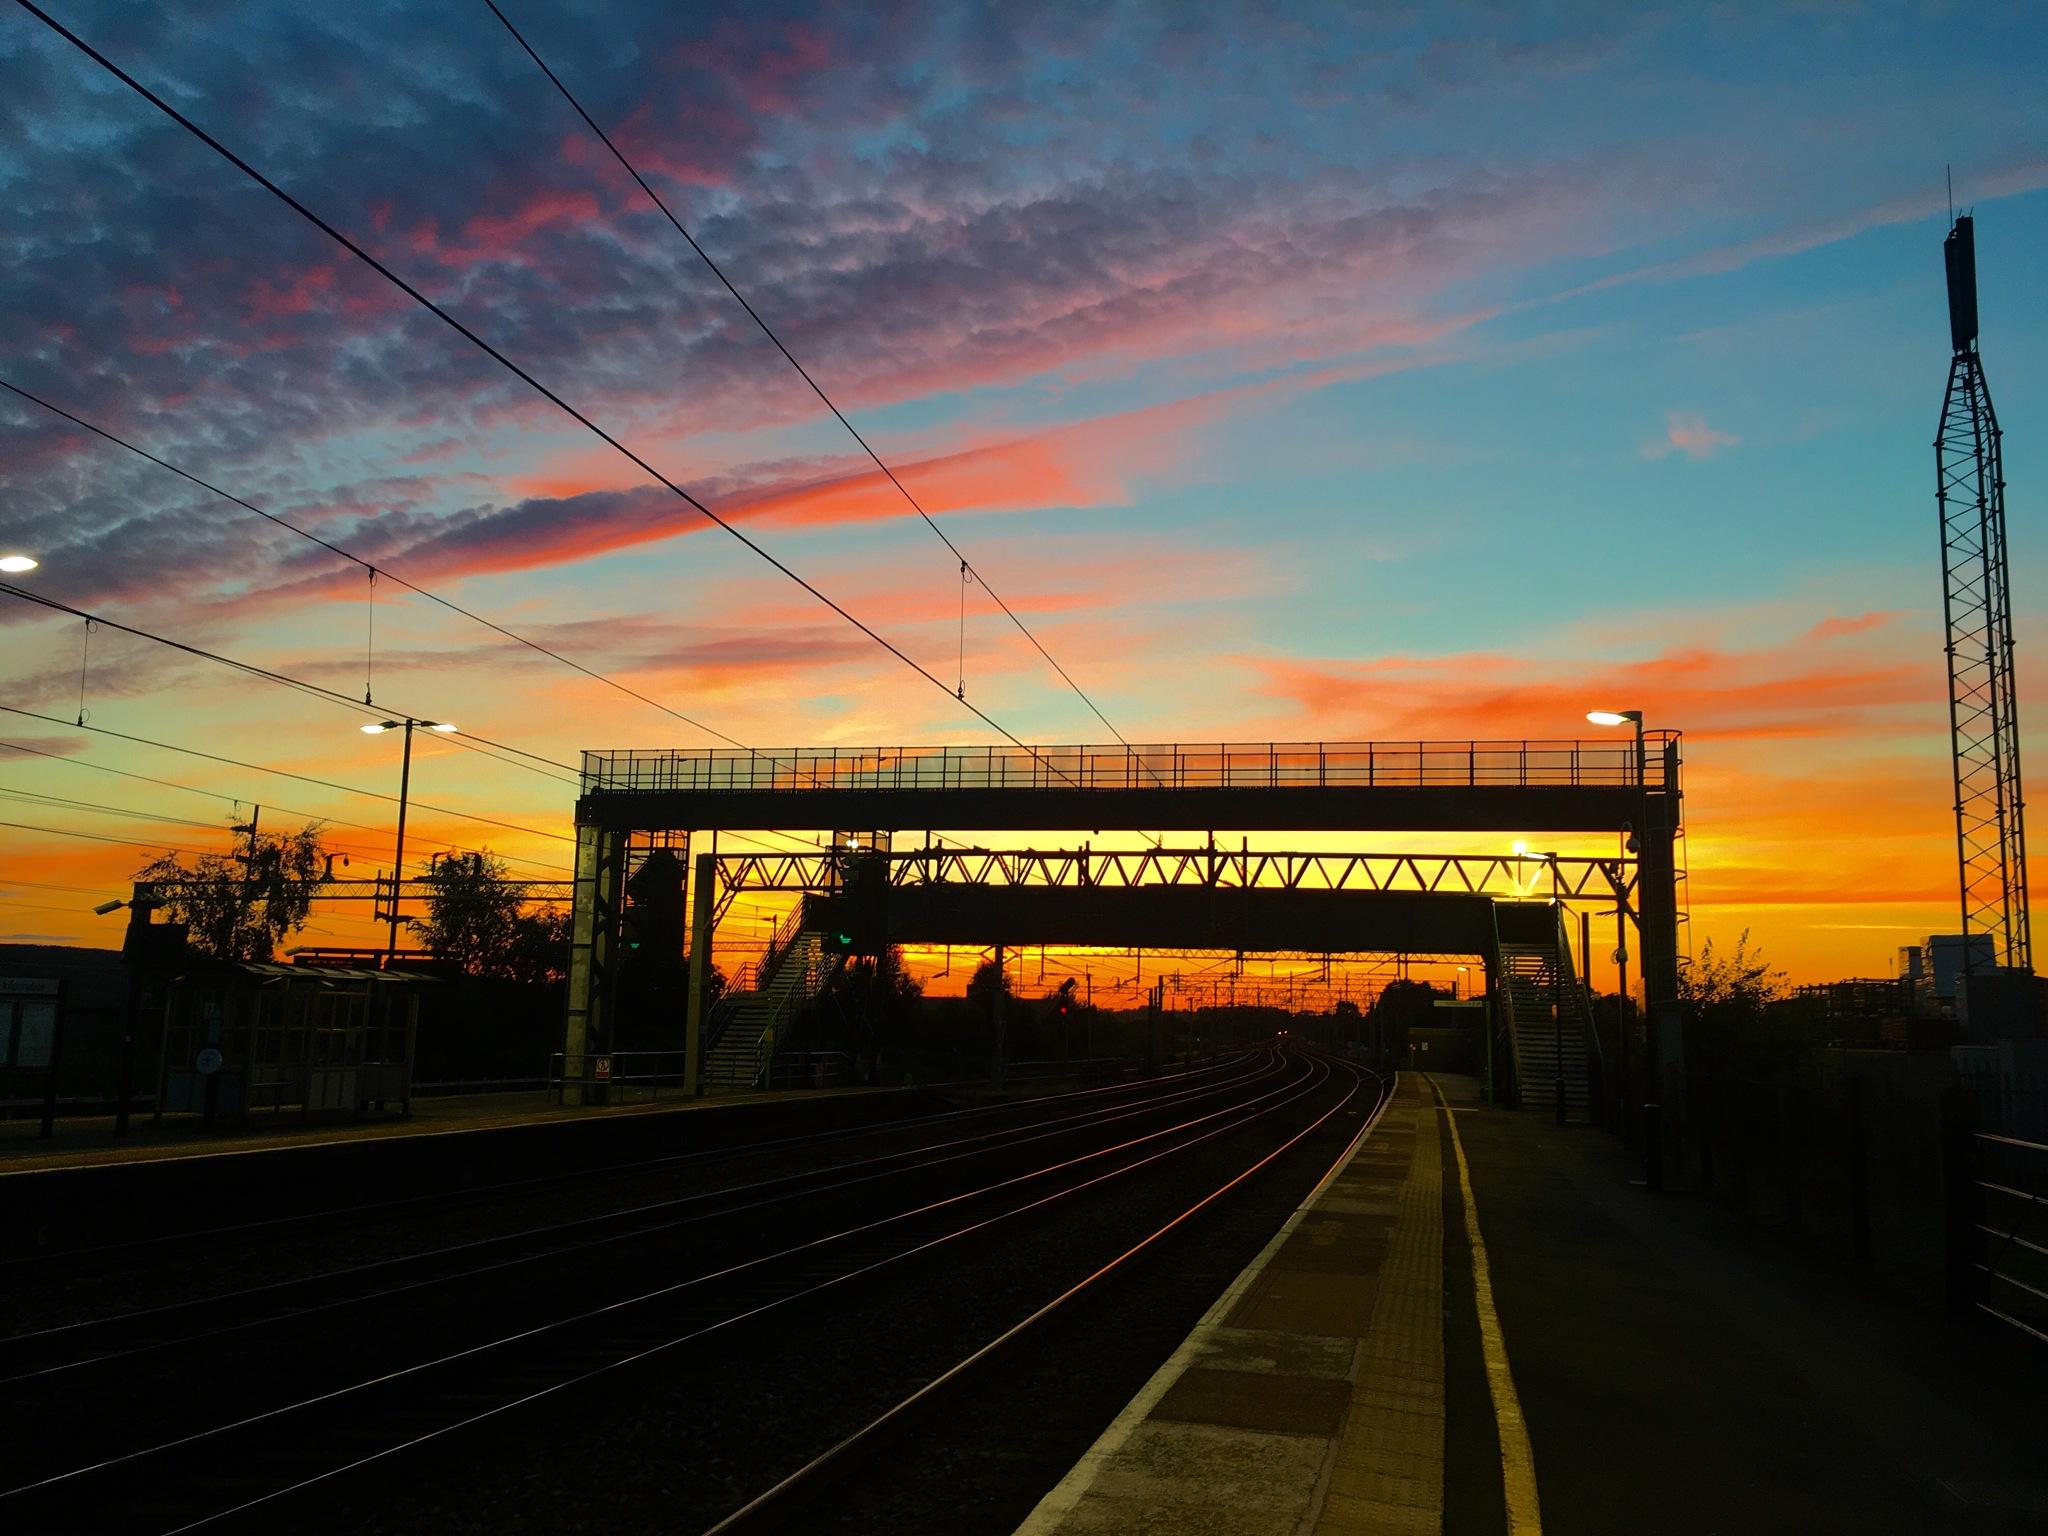 Sunset heaven  by RhiRhi Marie